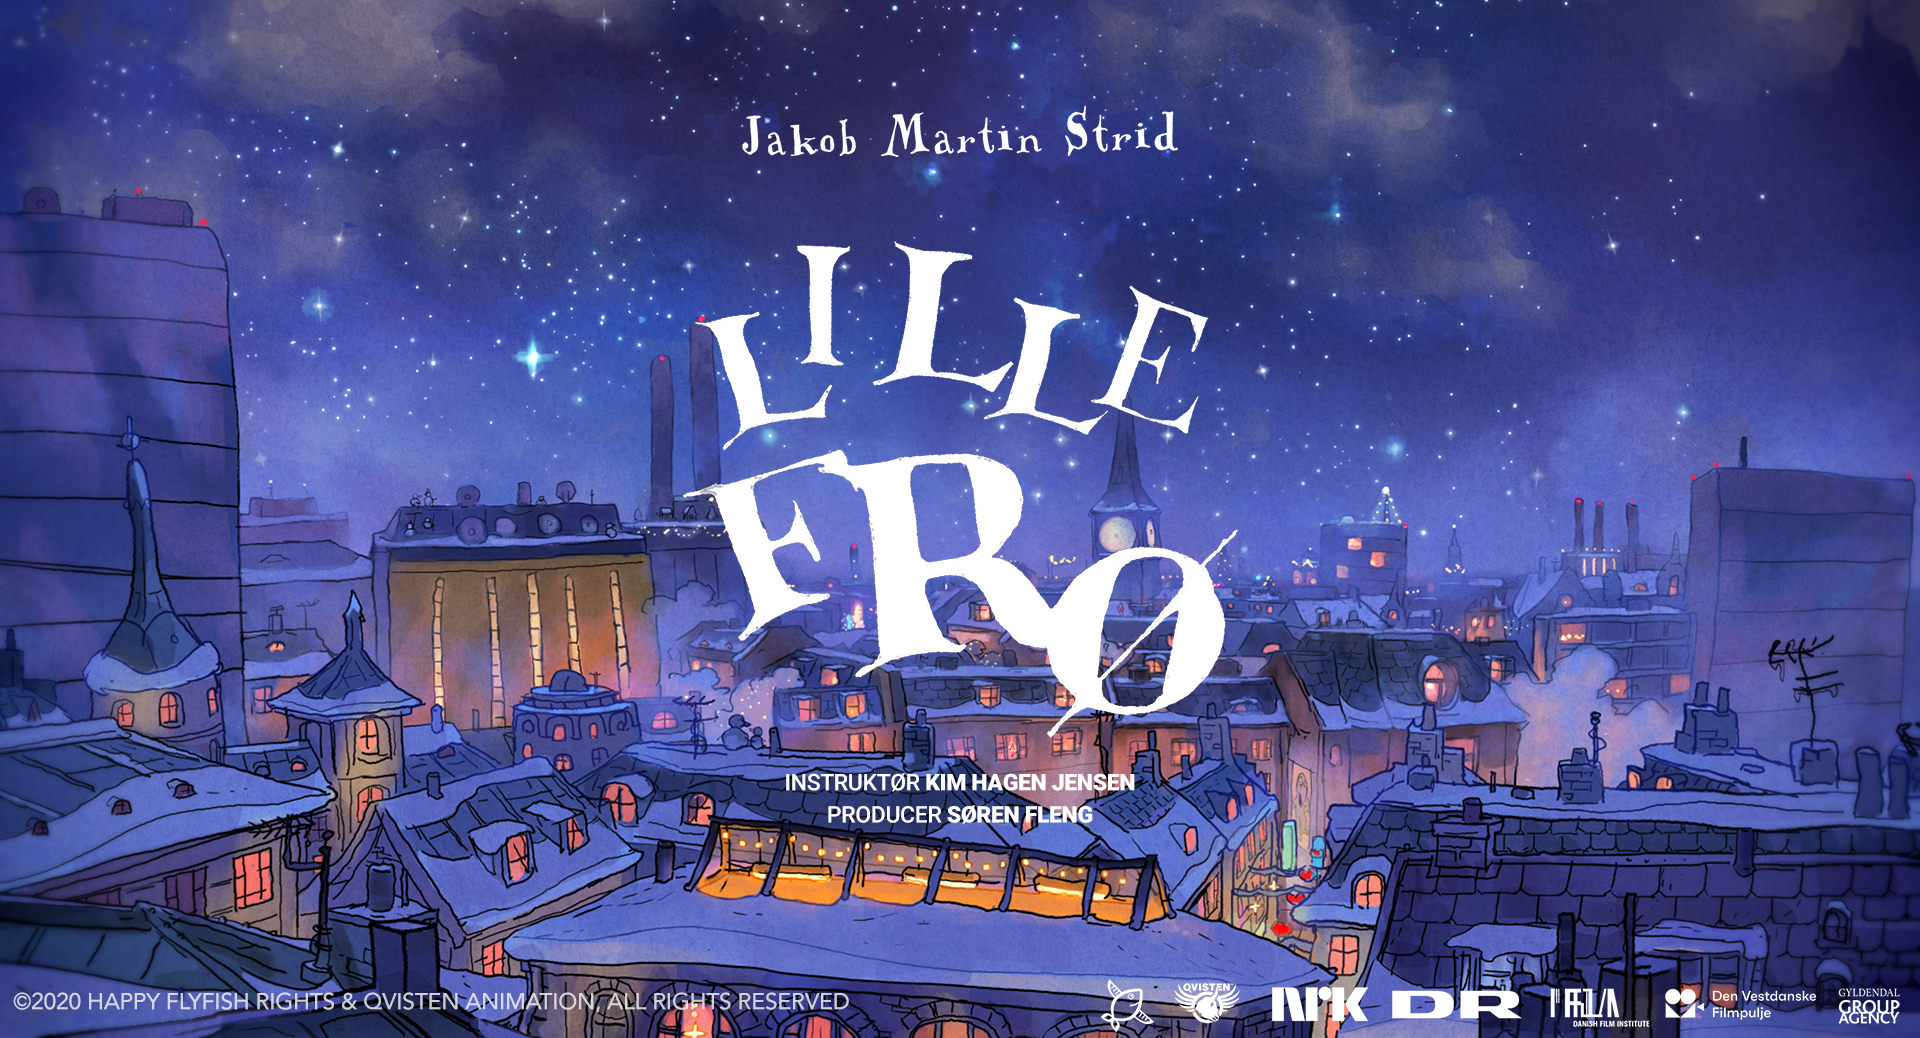 Lille Frø (Little Frog)